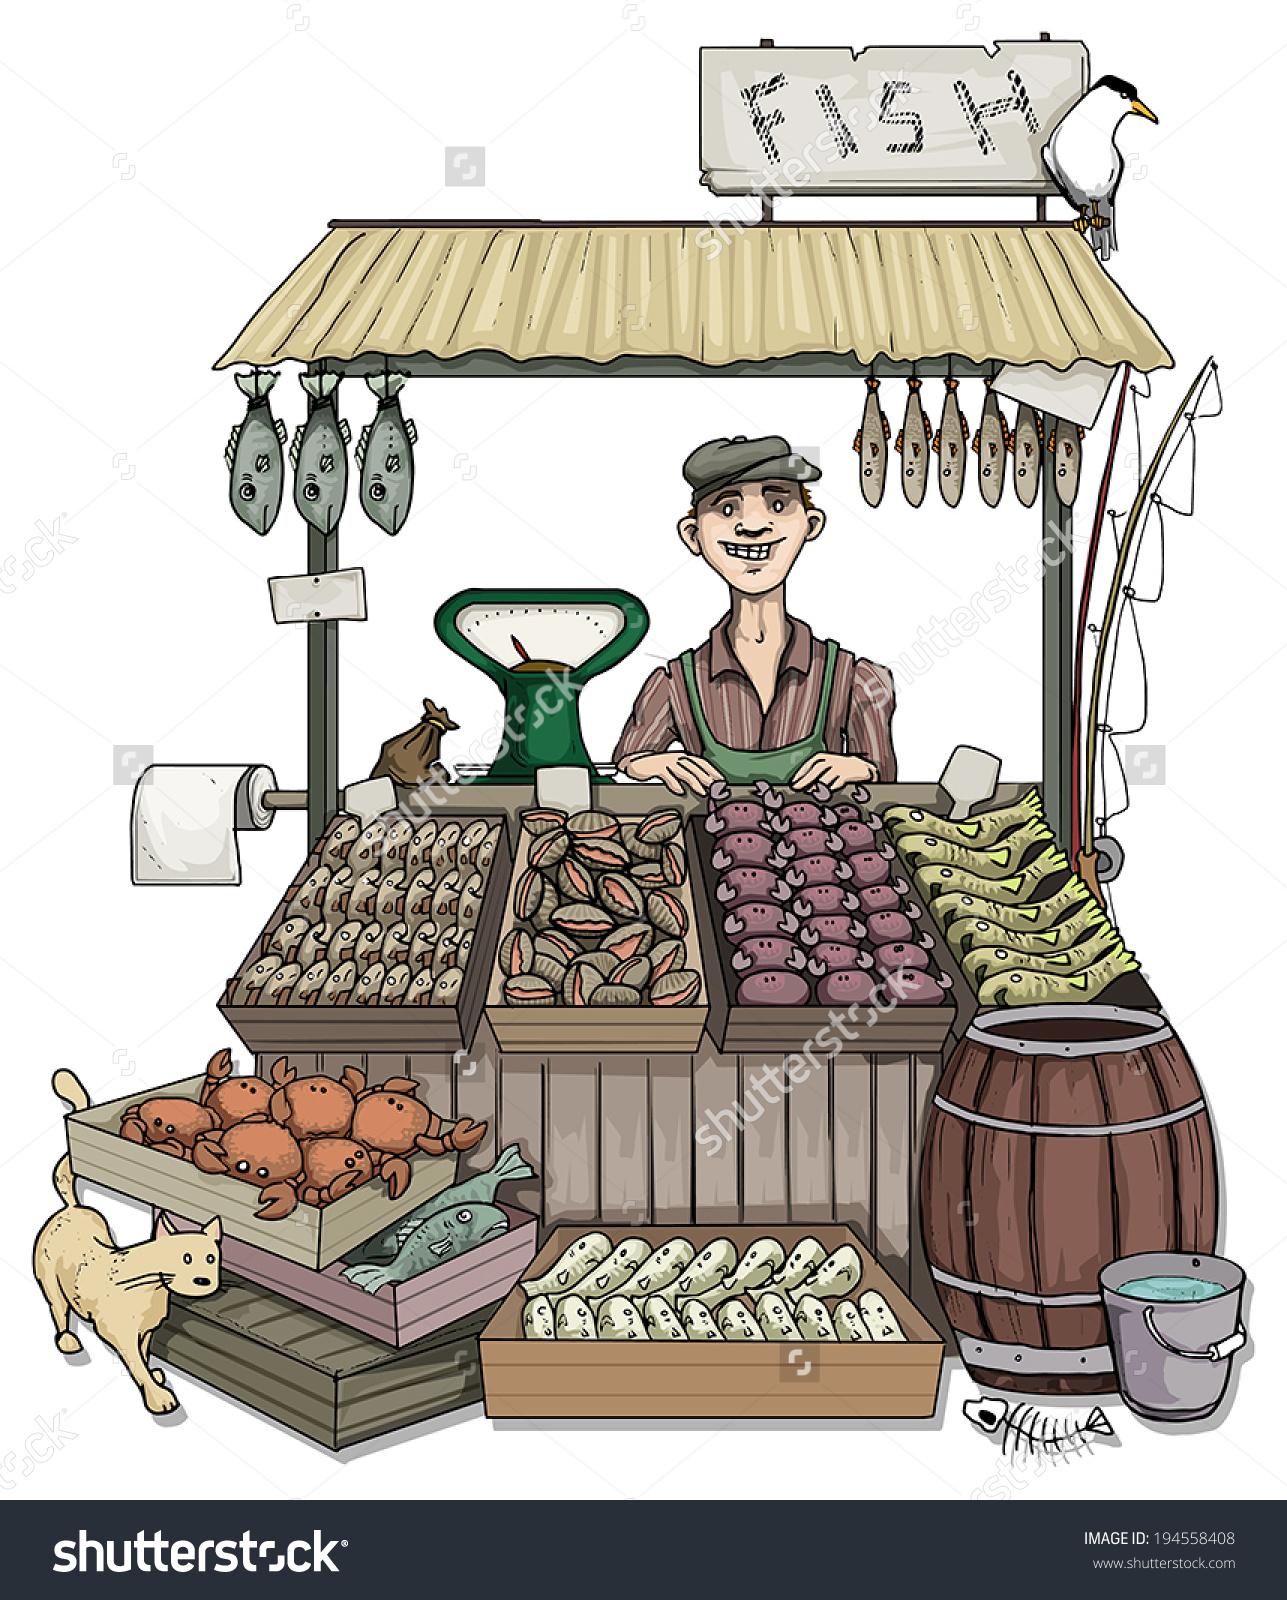 Man Selling Fish Outdoors Market Vector Stock Vector 194558408.